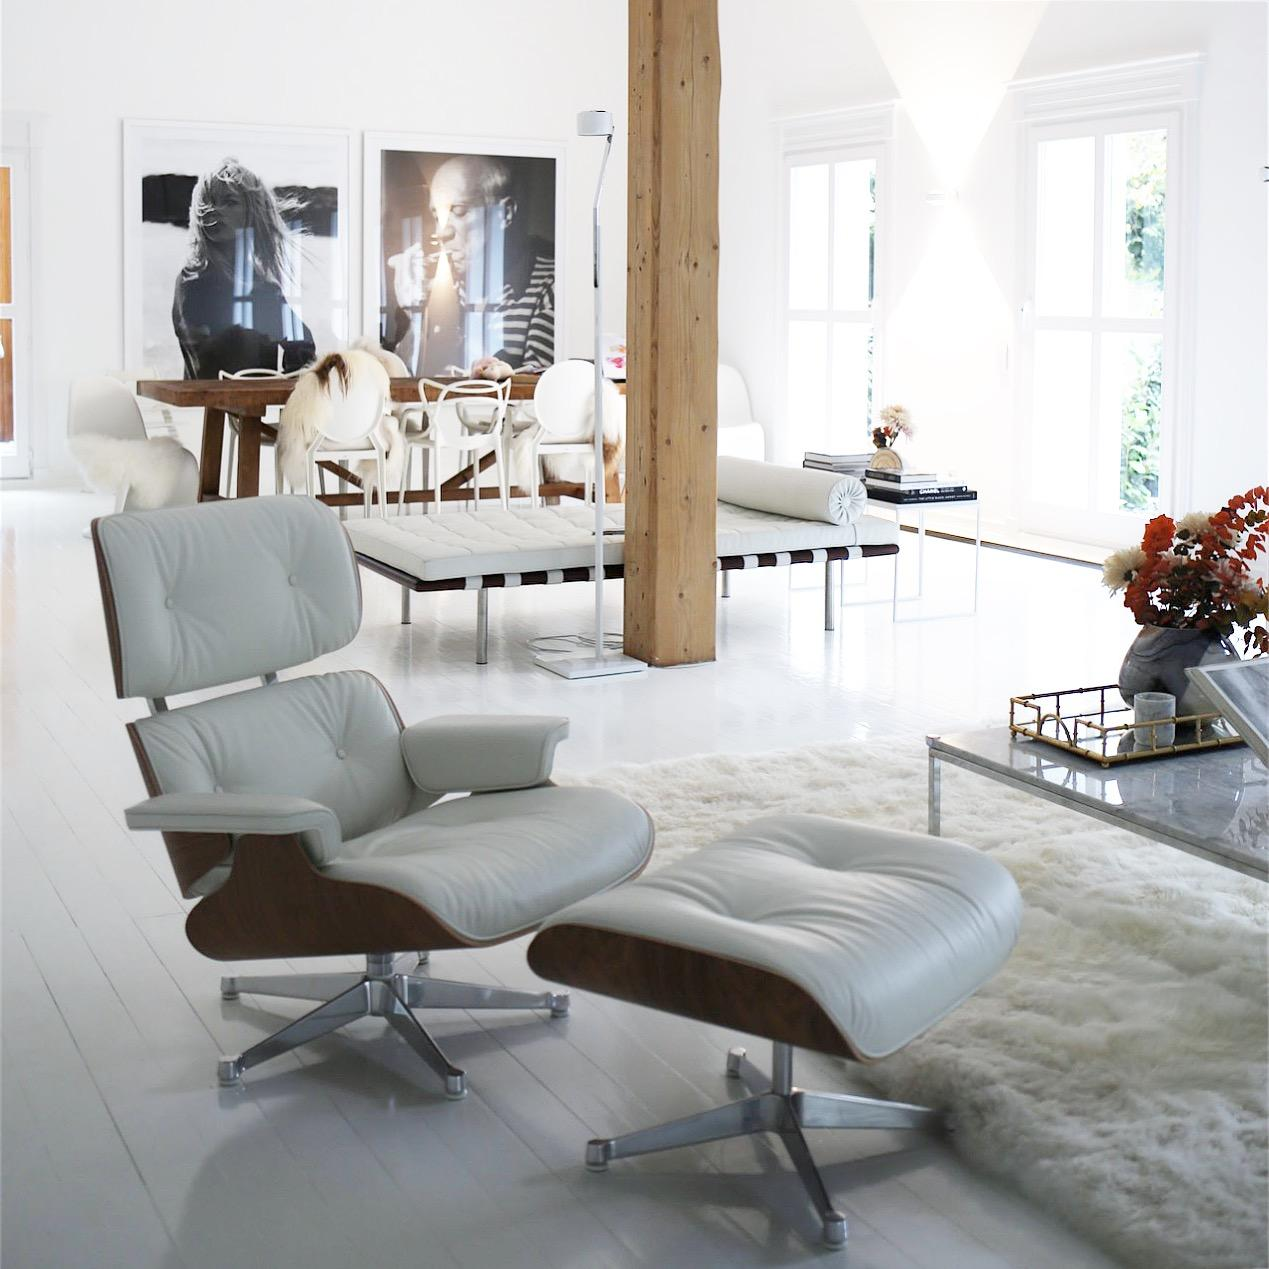 couchtisch bilder ideen couchstyle. Black Bedroom Furniture Sets. Home Design Ideas